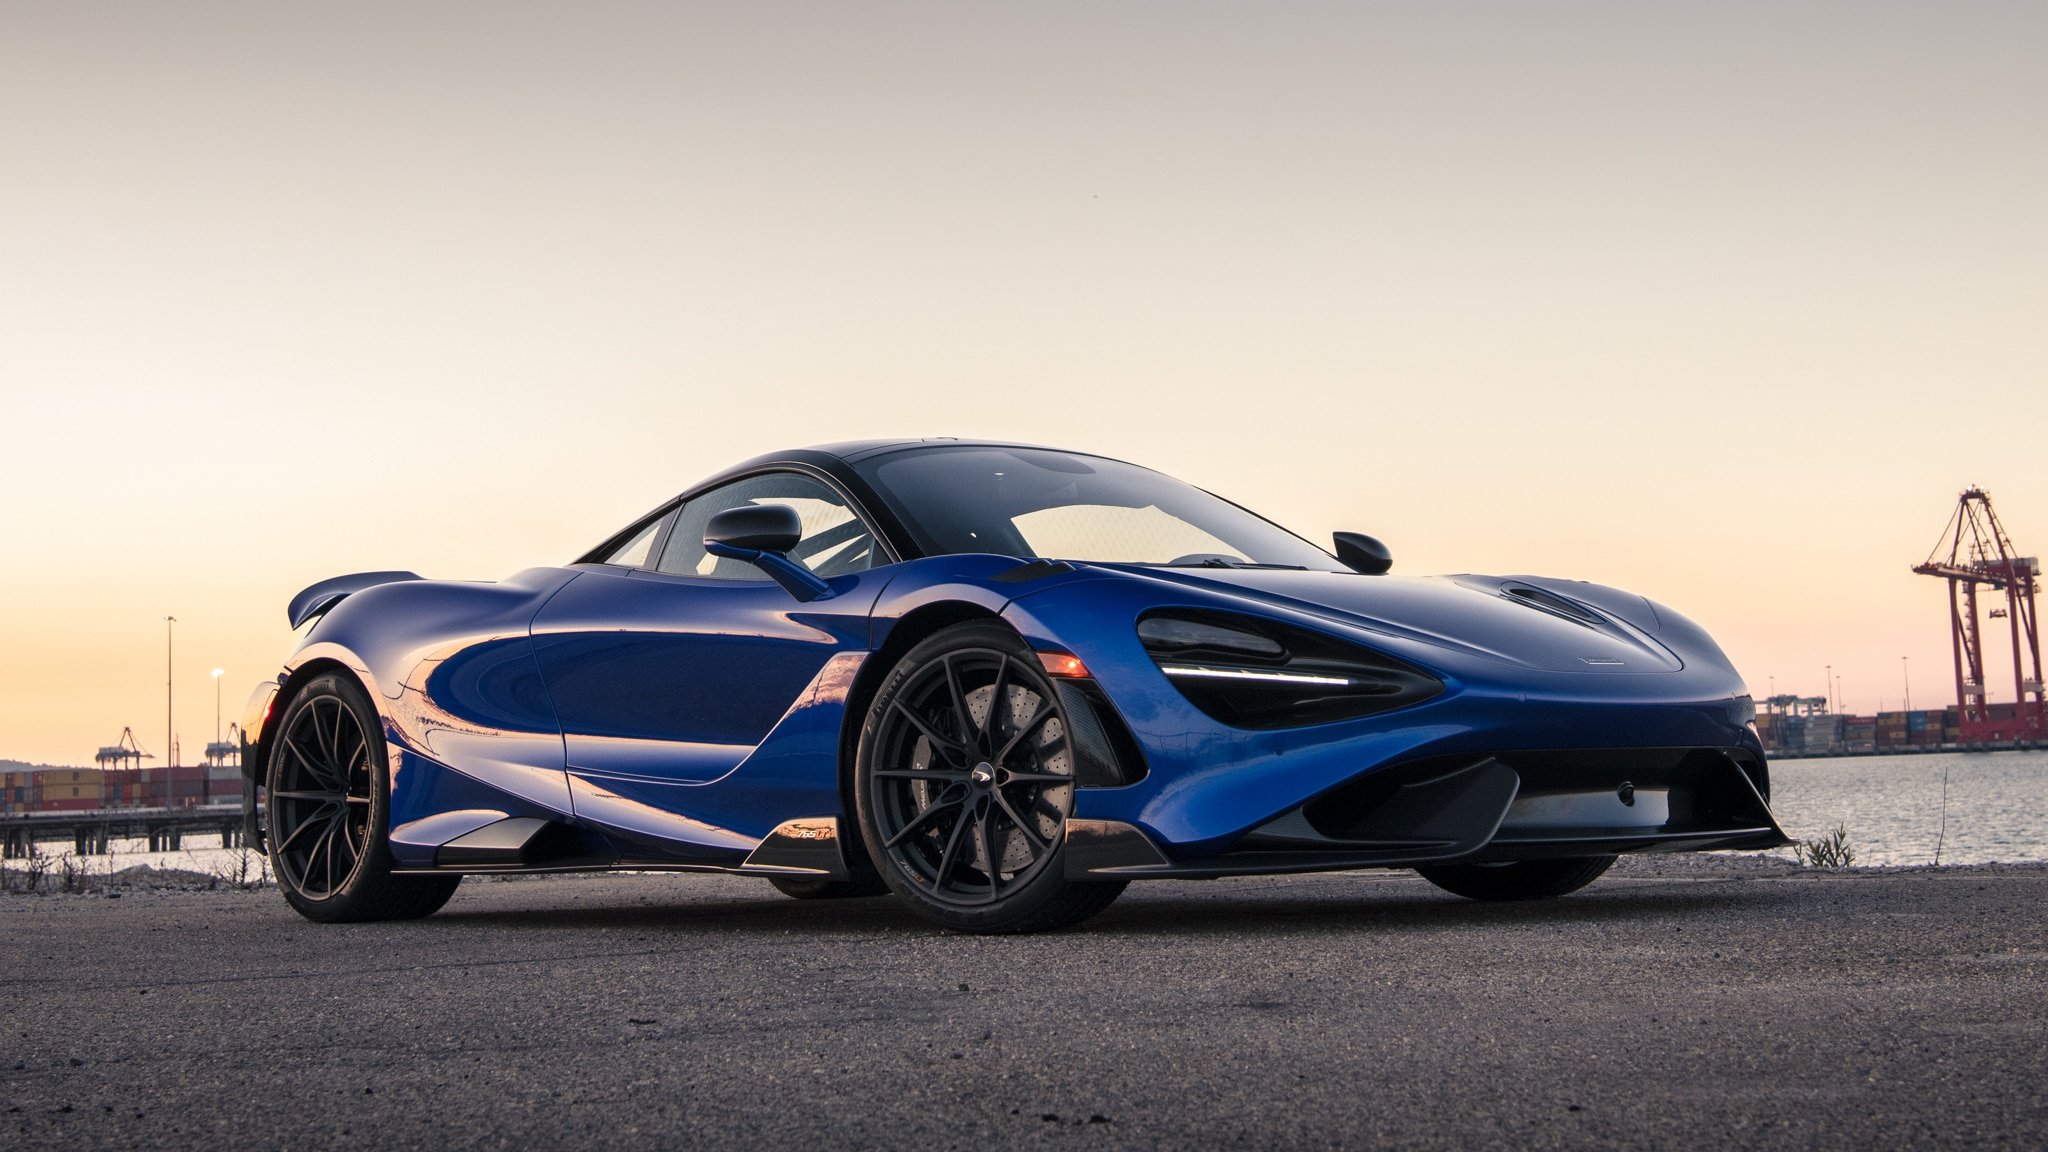 Driven: The 2021 McLaren 765LT Will Warp Your Perception of Speed